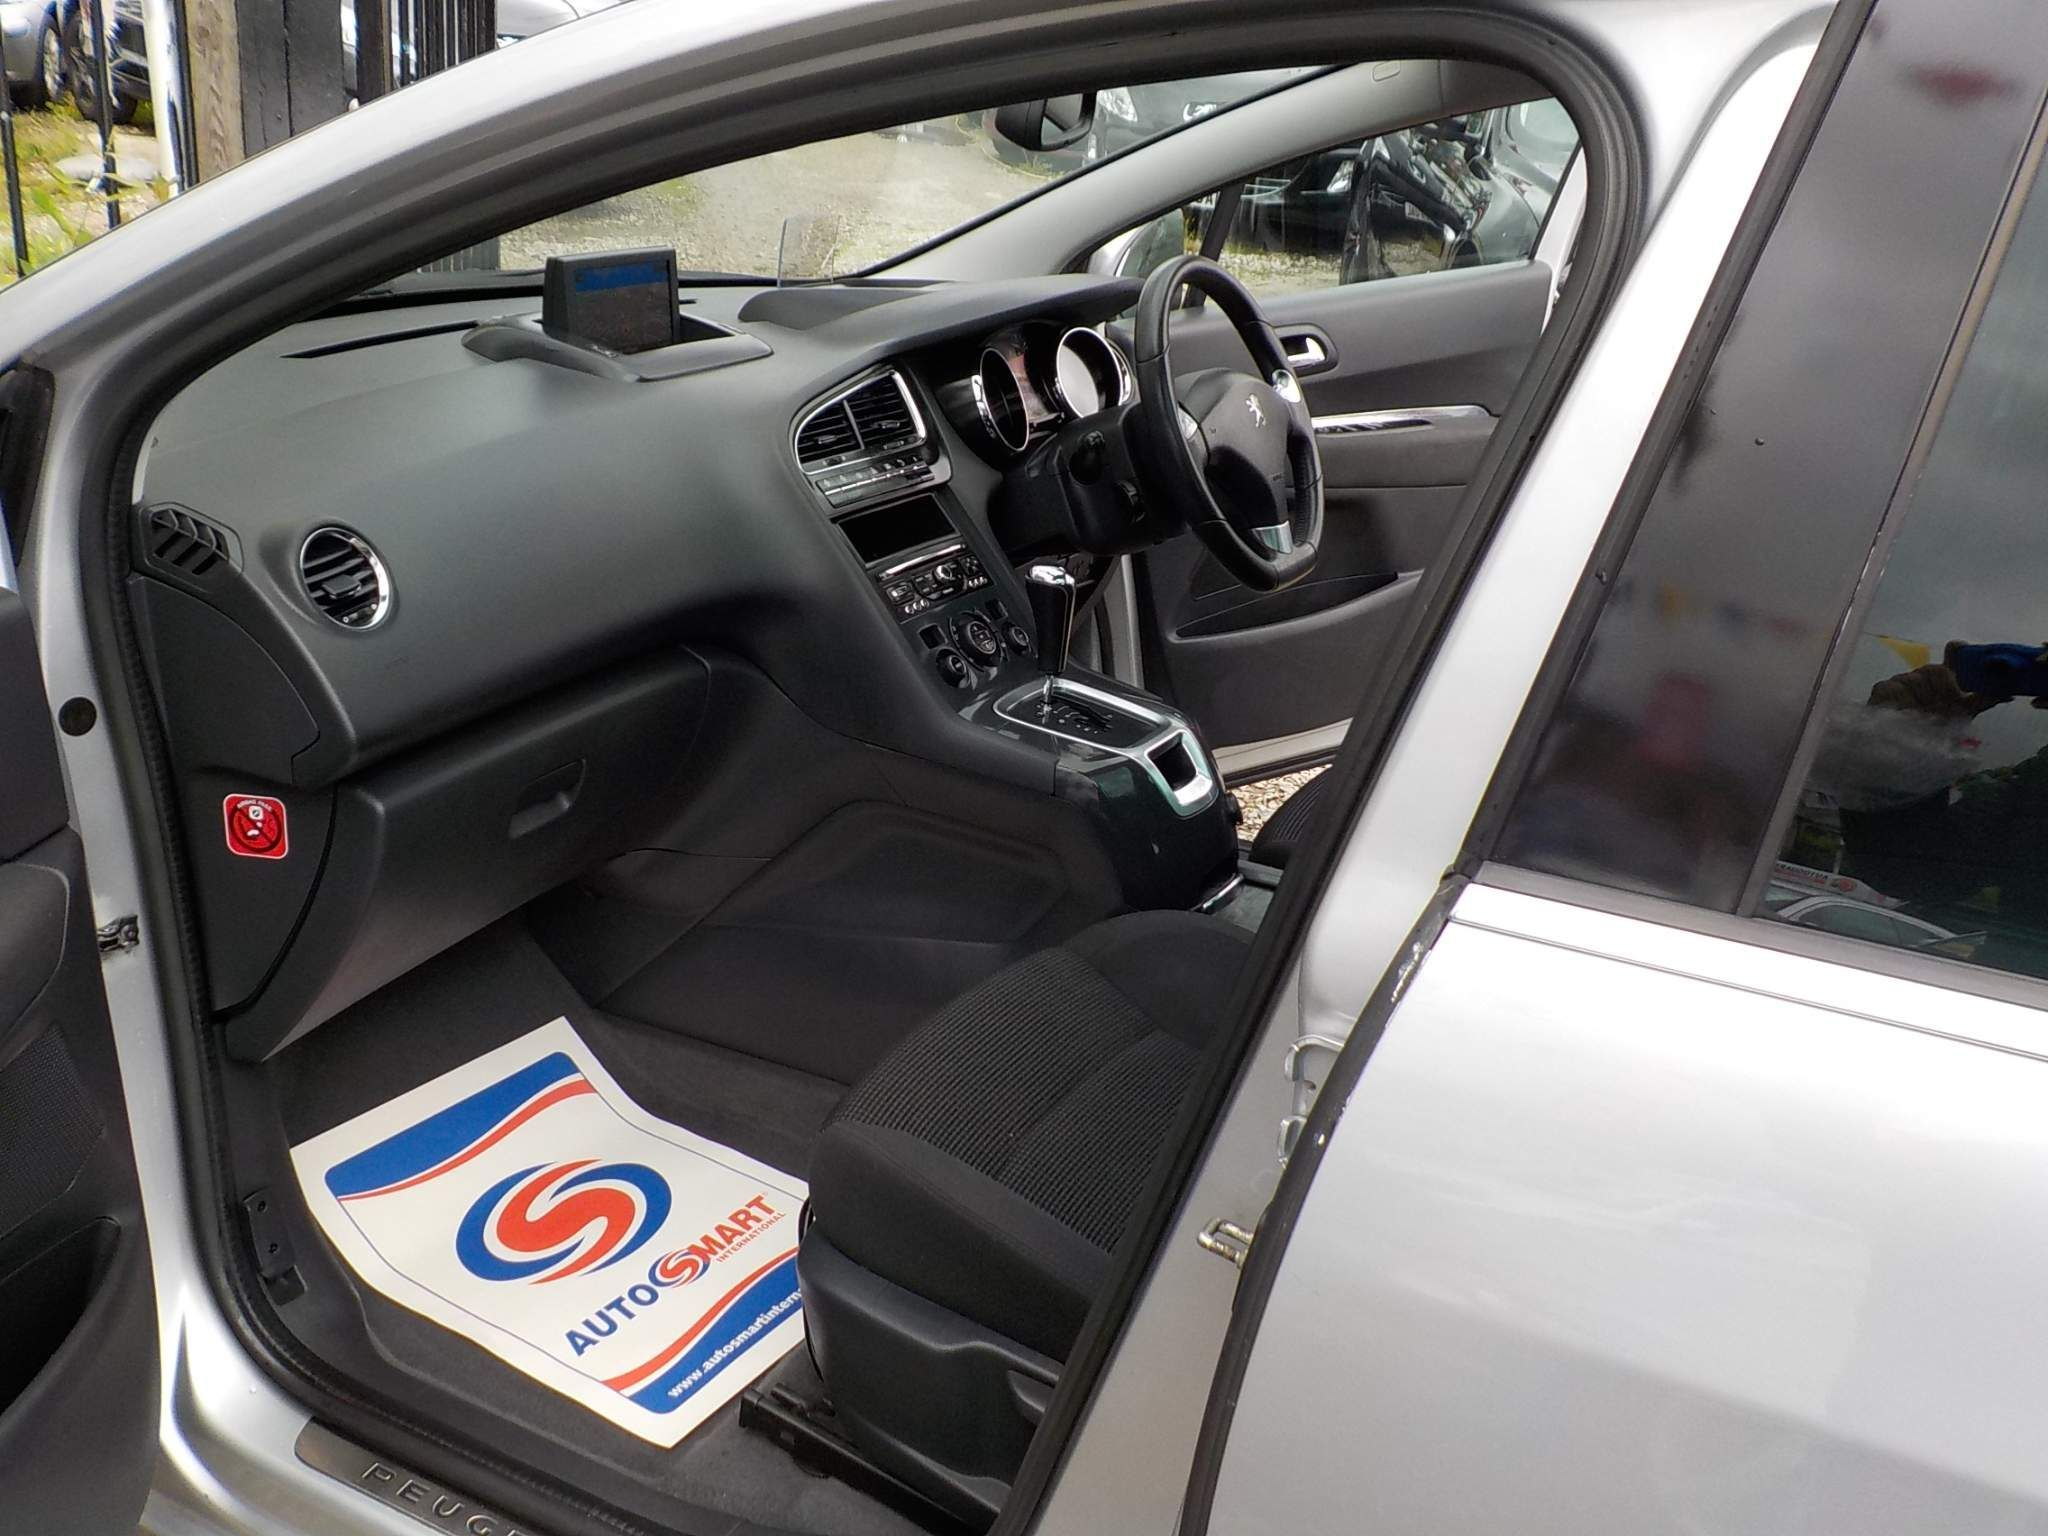 Peugeot 5008 2.0 HDi FAP Allure 5dr